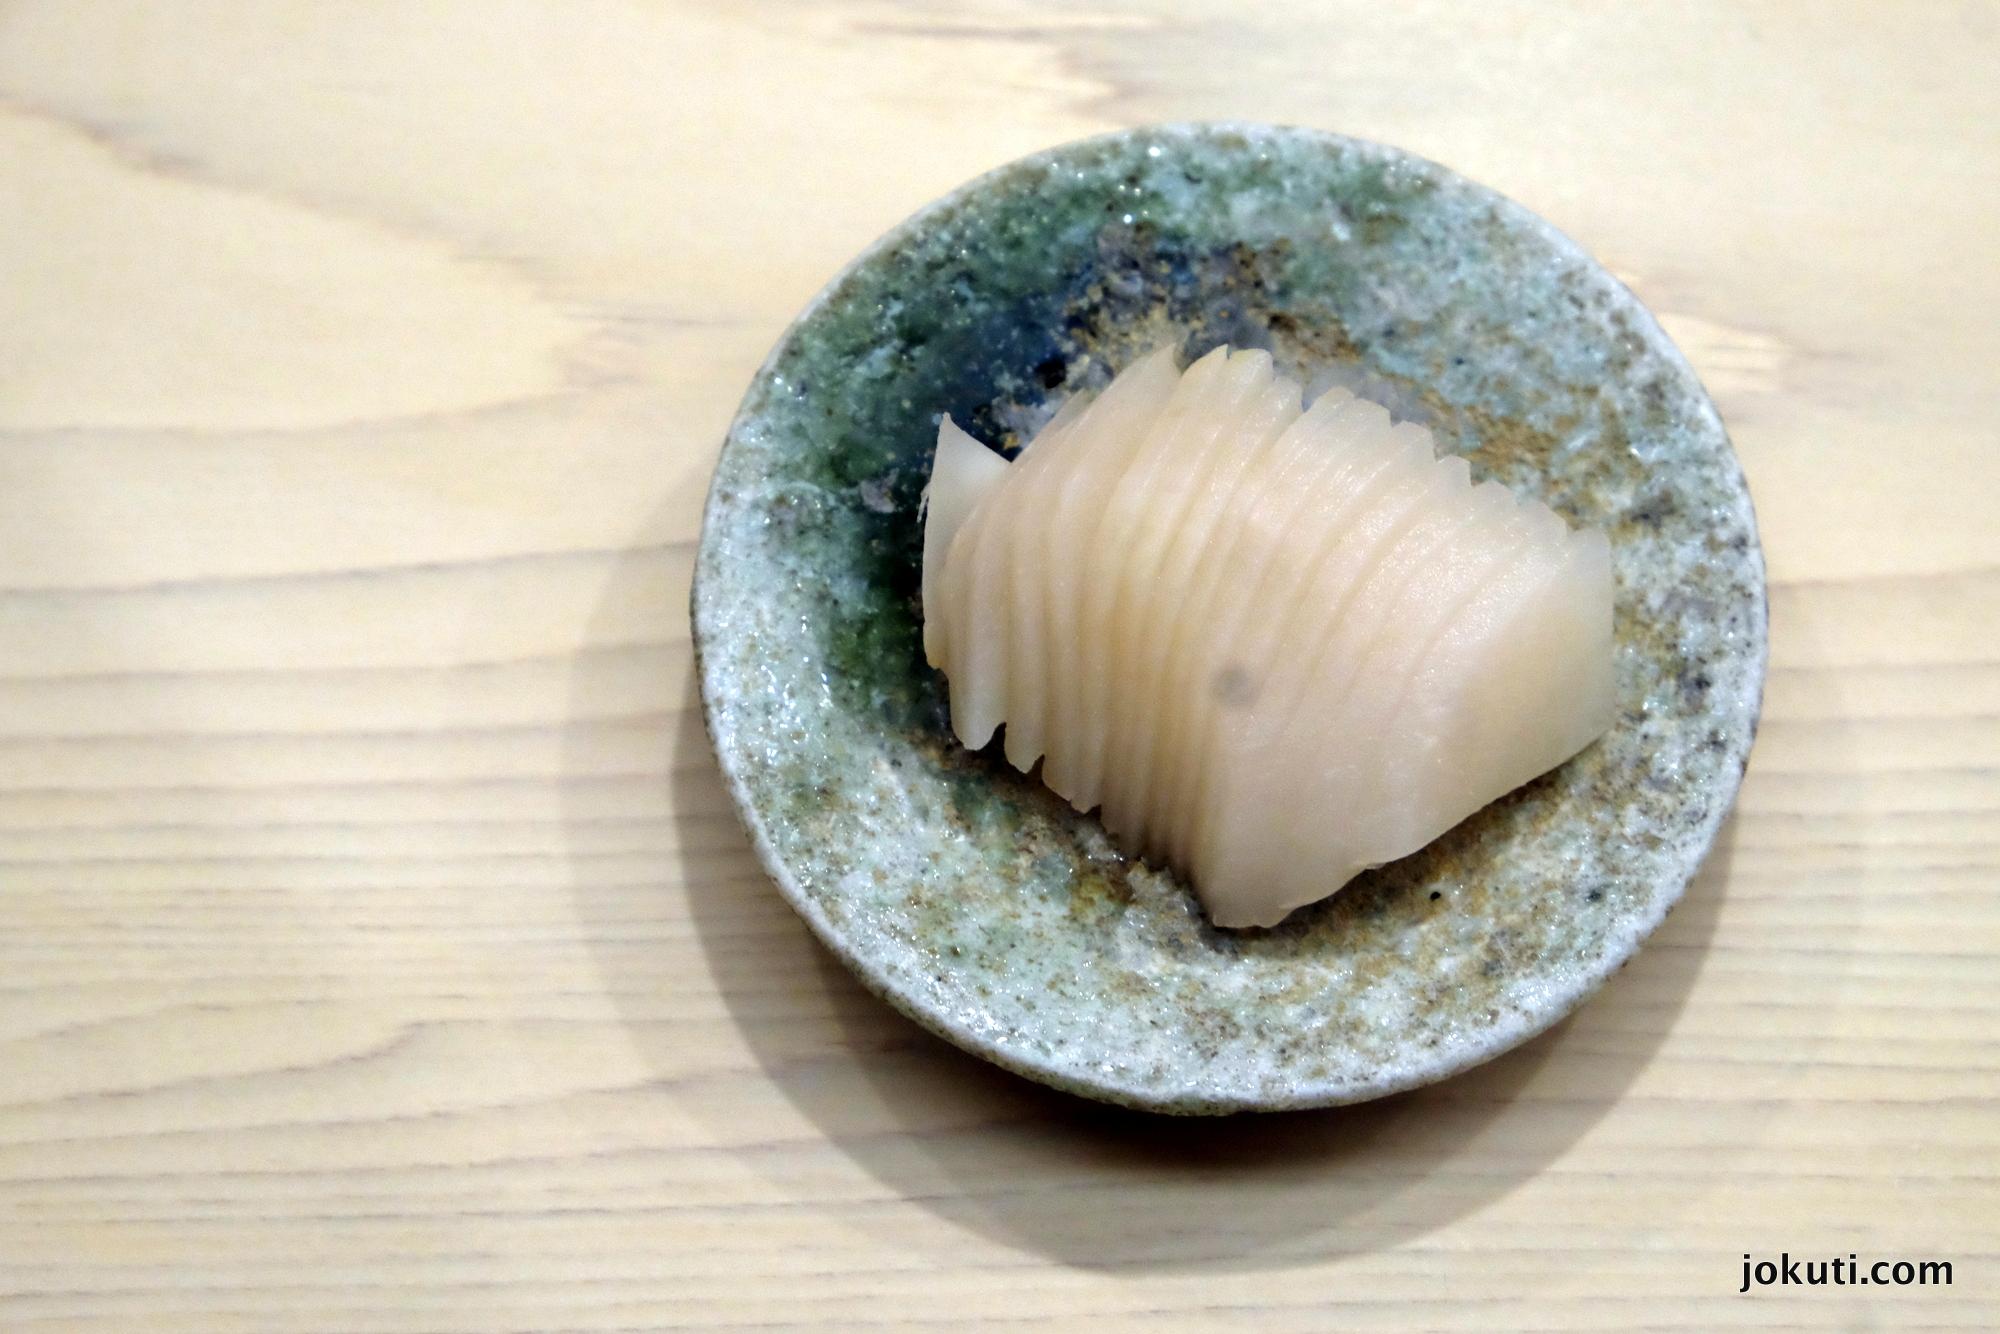 dscf5539_sugita_sushi_michelin_tokyo_japan_vilagevo_jokuti.jpg